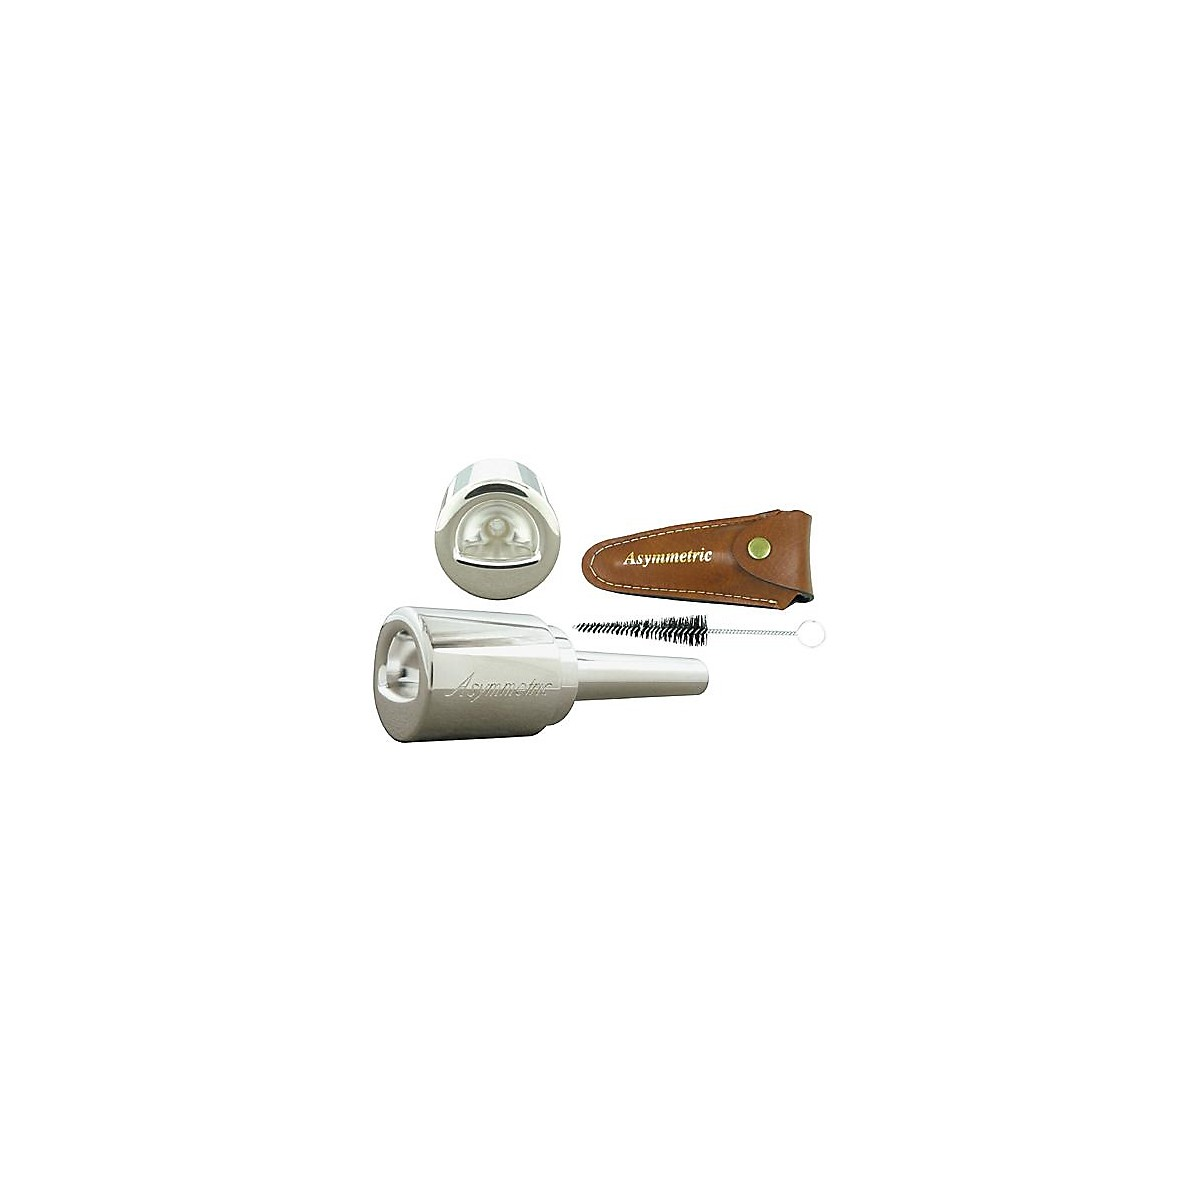 Asymmetric Opera 545 Trumpet Mouthpiece